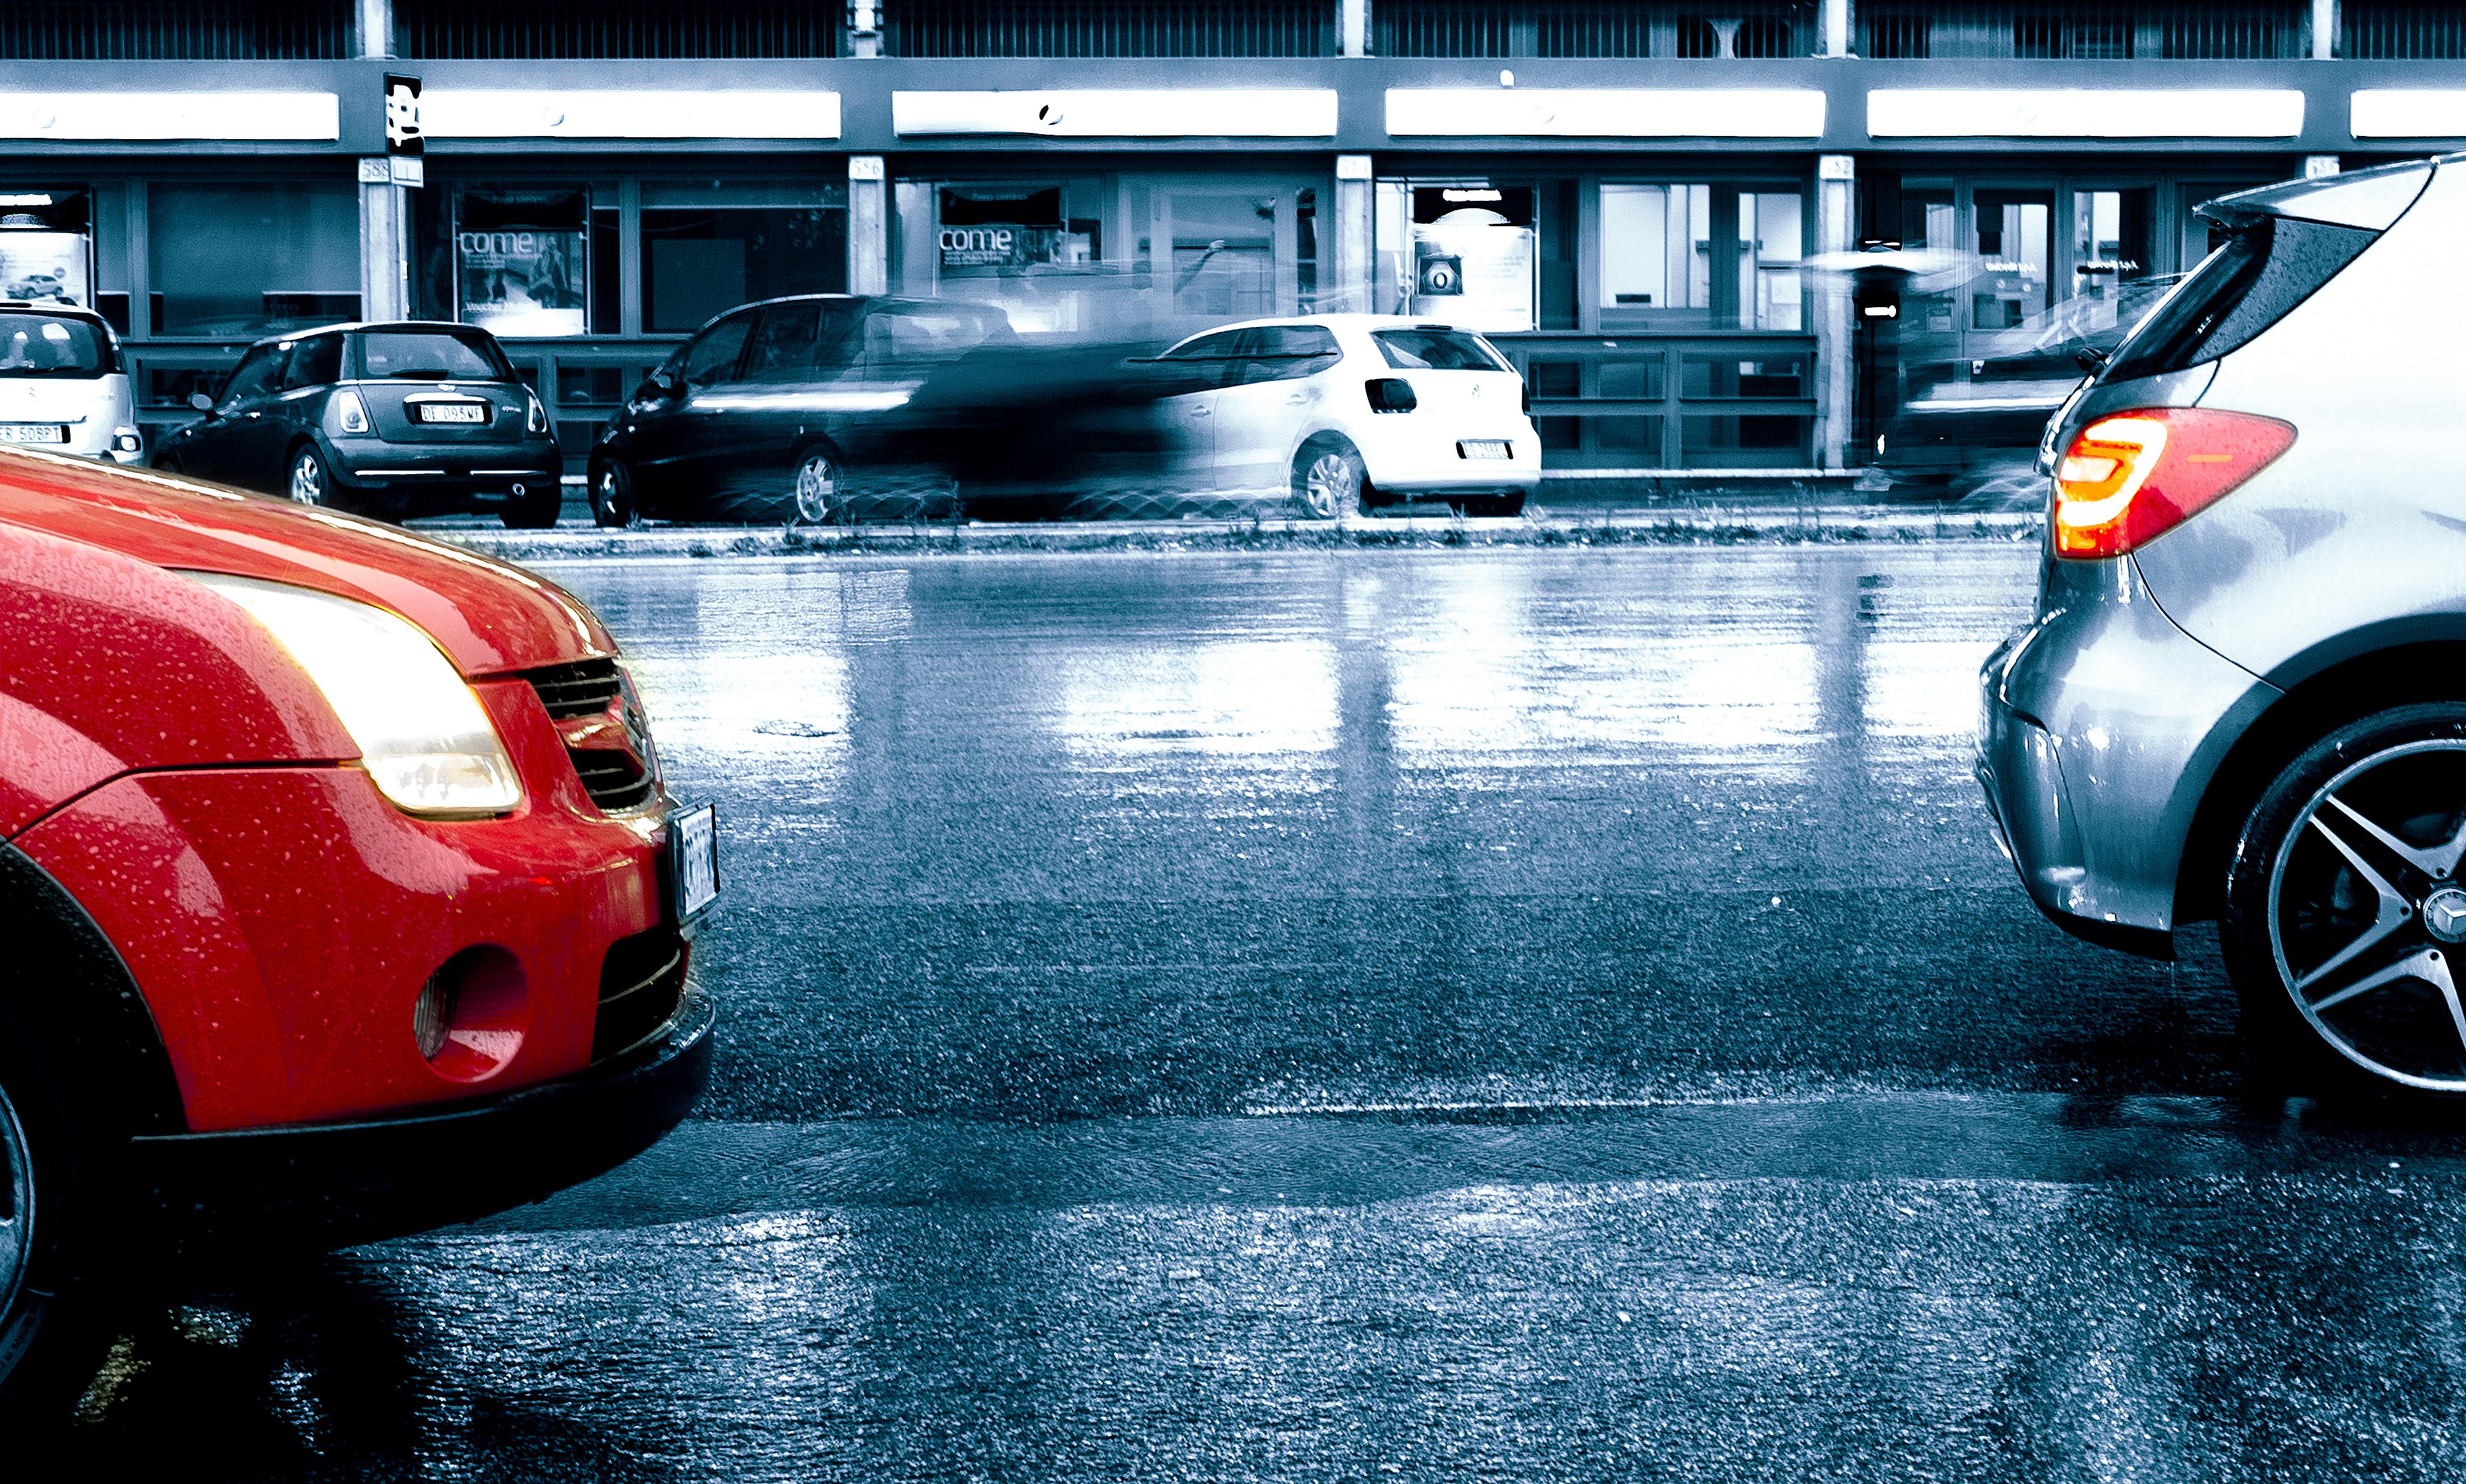 00A-1509 MONTIB CAR URB RAIN X10, No copyright, Photo, Professional, Night, HQ Photo